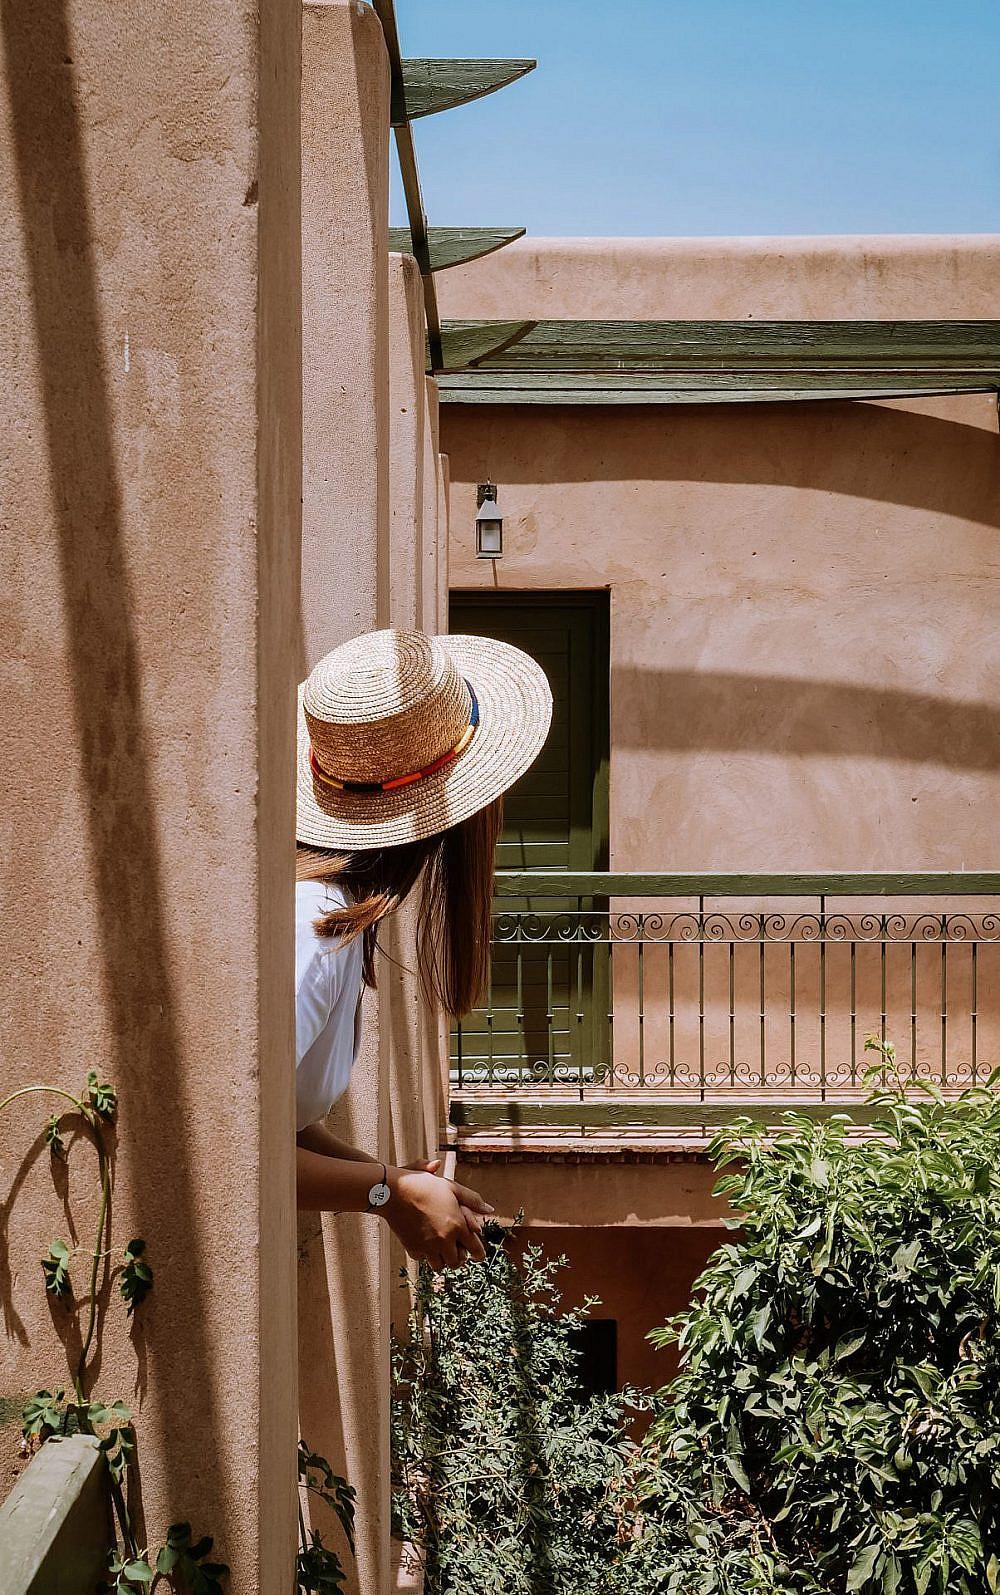 טרה שיק   צילום באדיבות Club Med Marrakech la Palmeraie